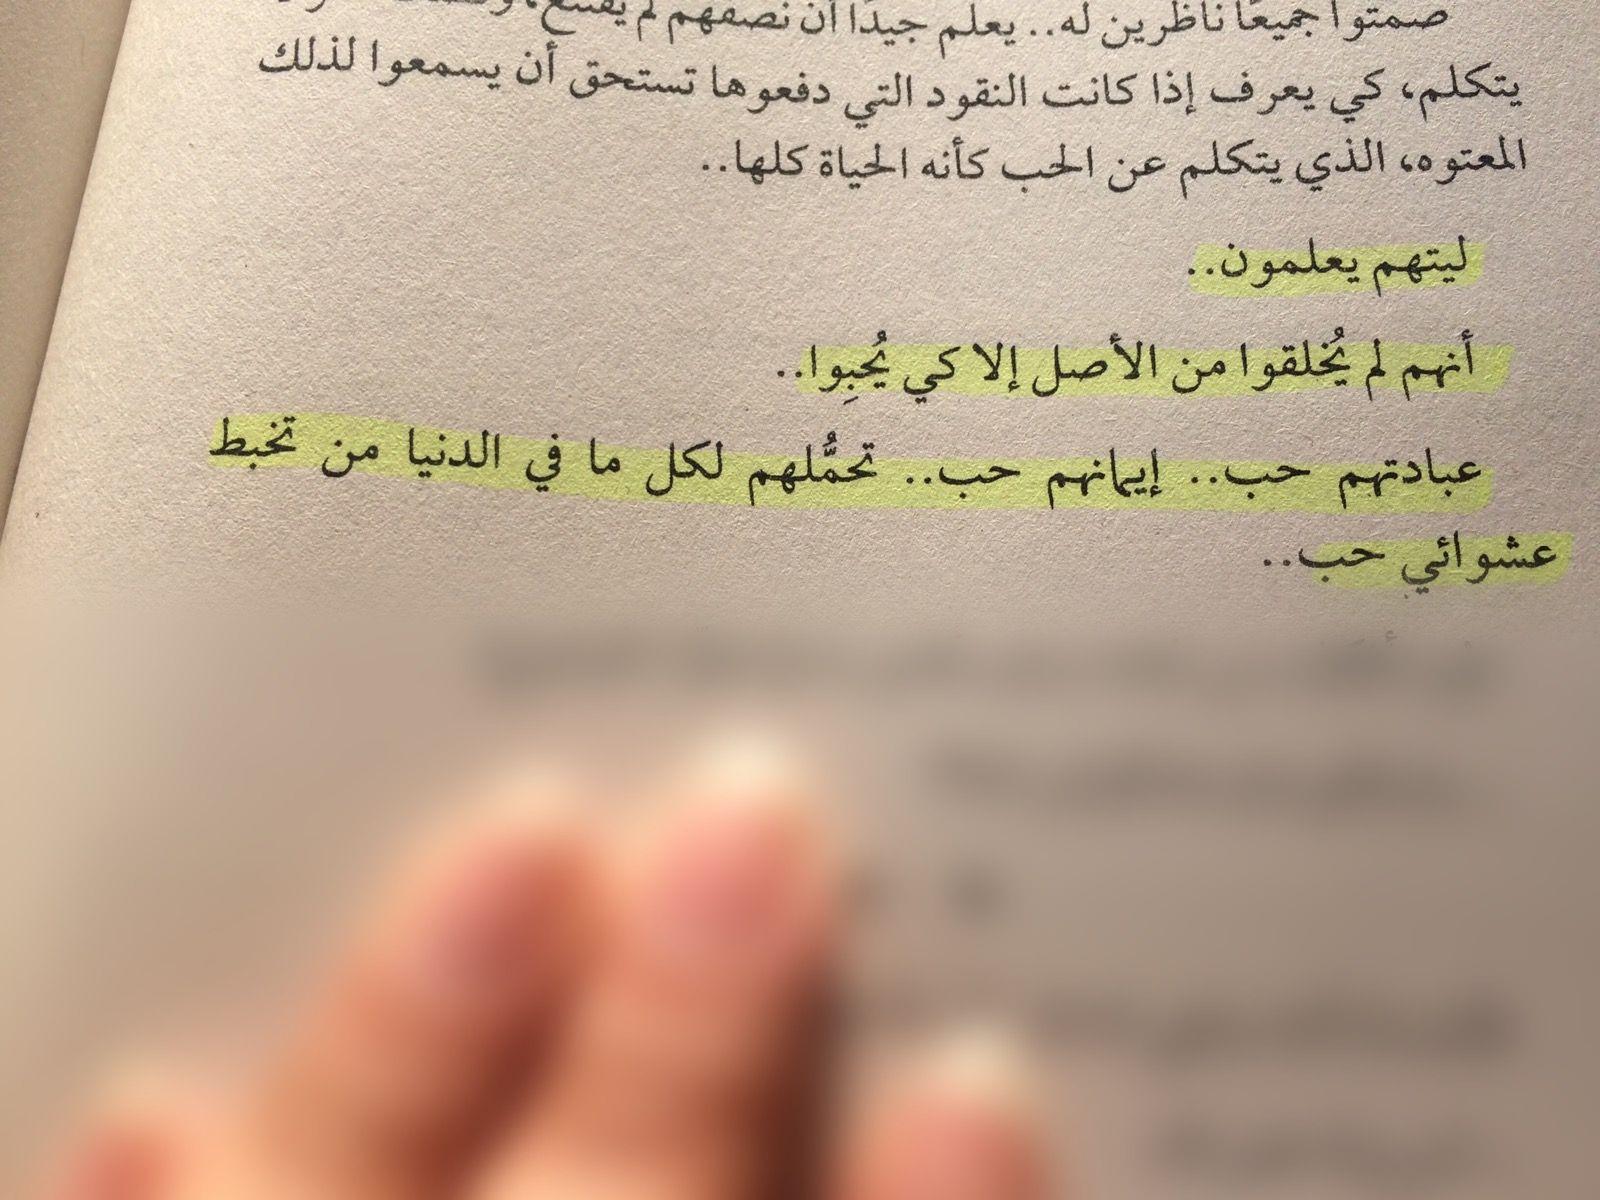 من رواية هيبتا محم د صادق Arabic Quotes Quotations Book Quotes